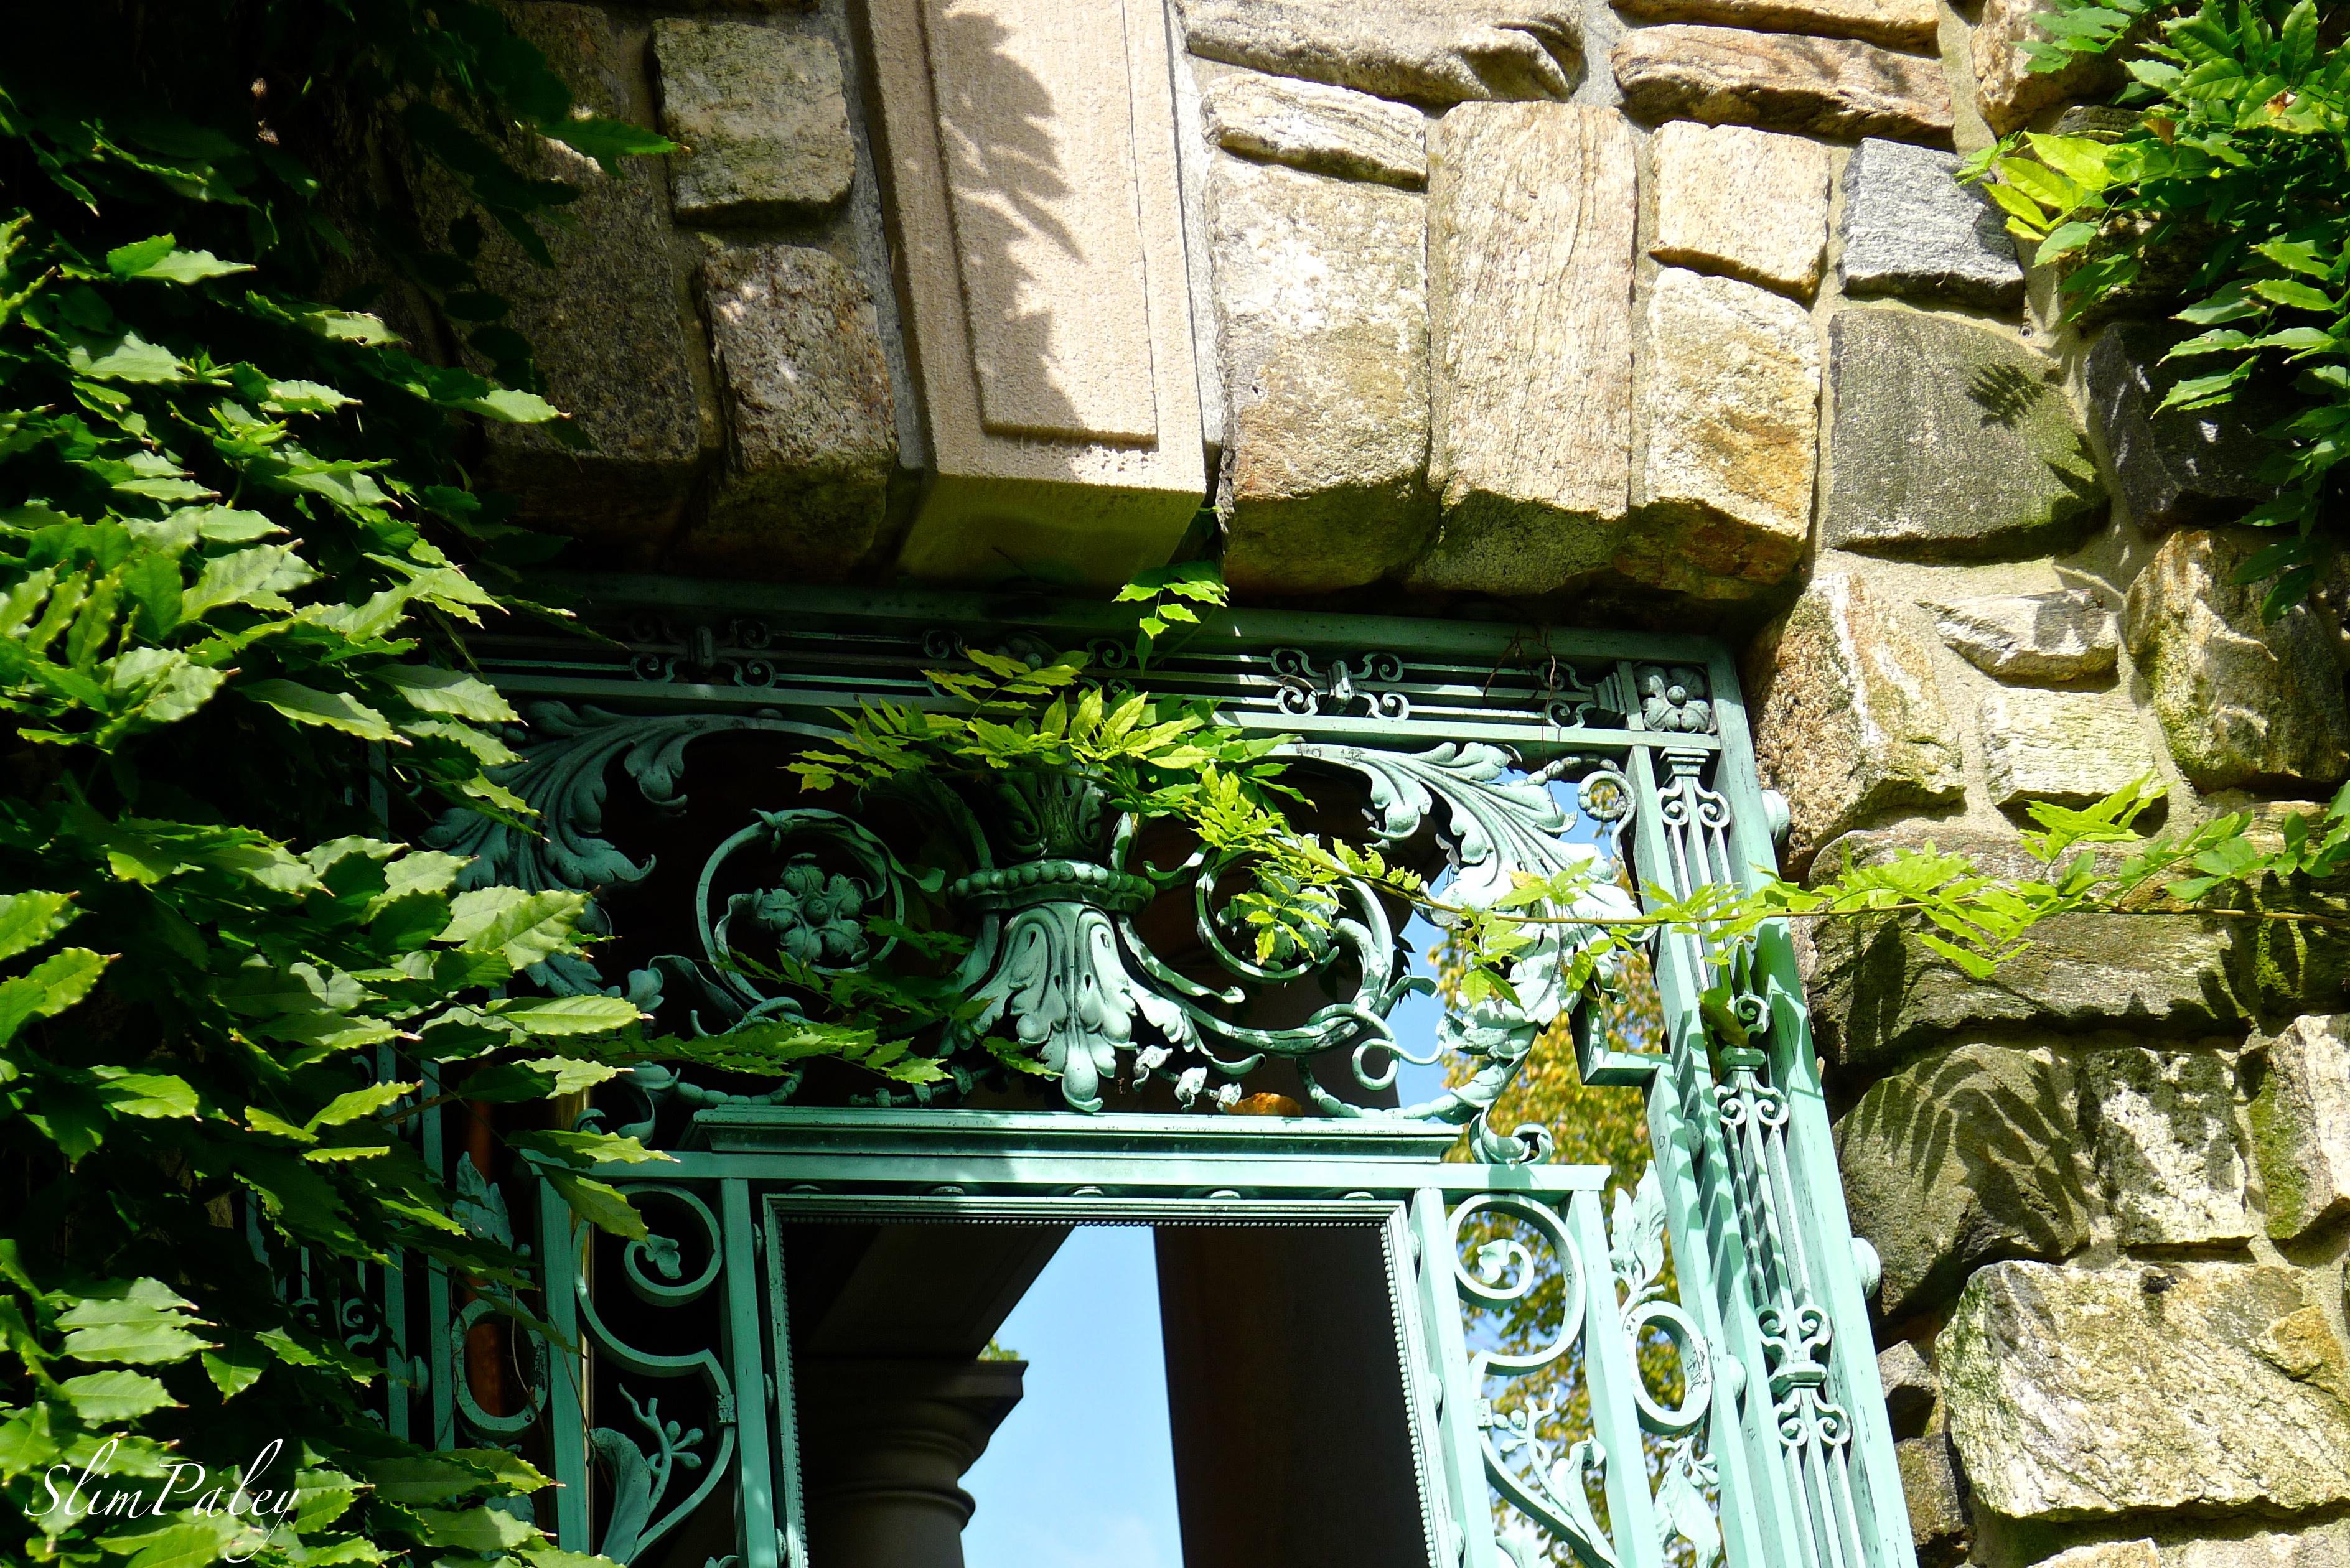 window detail, Kykuit, slimpaley.com